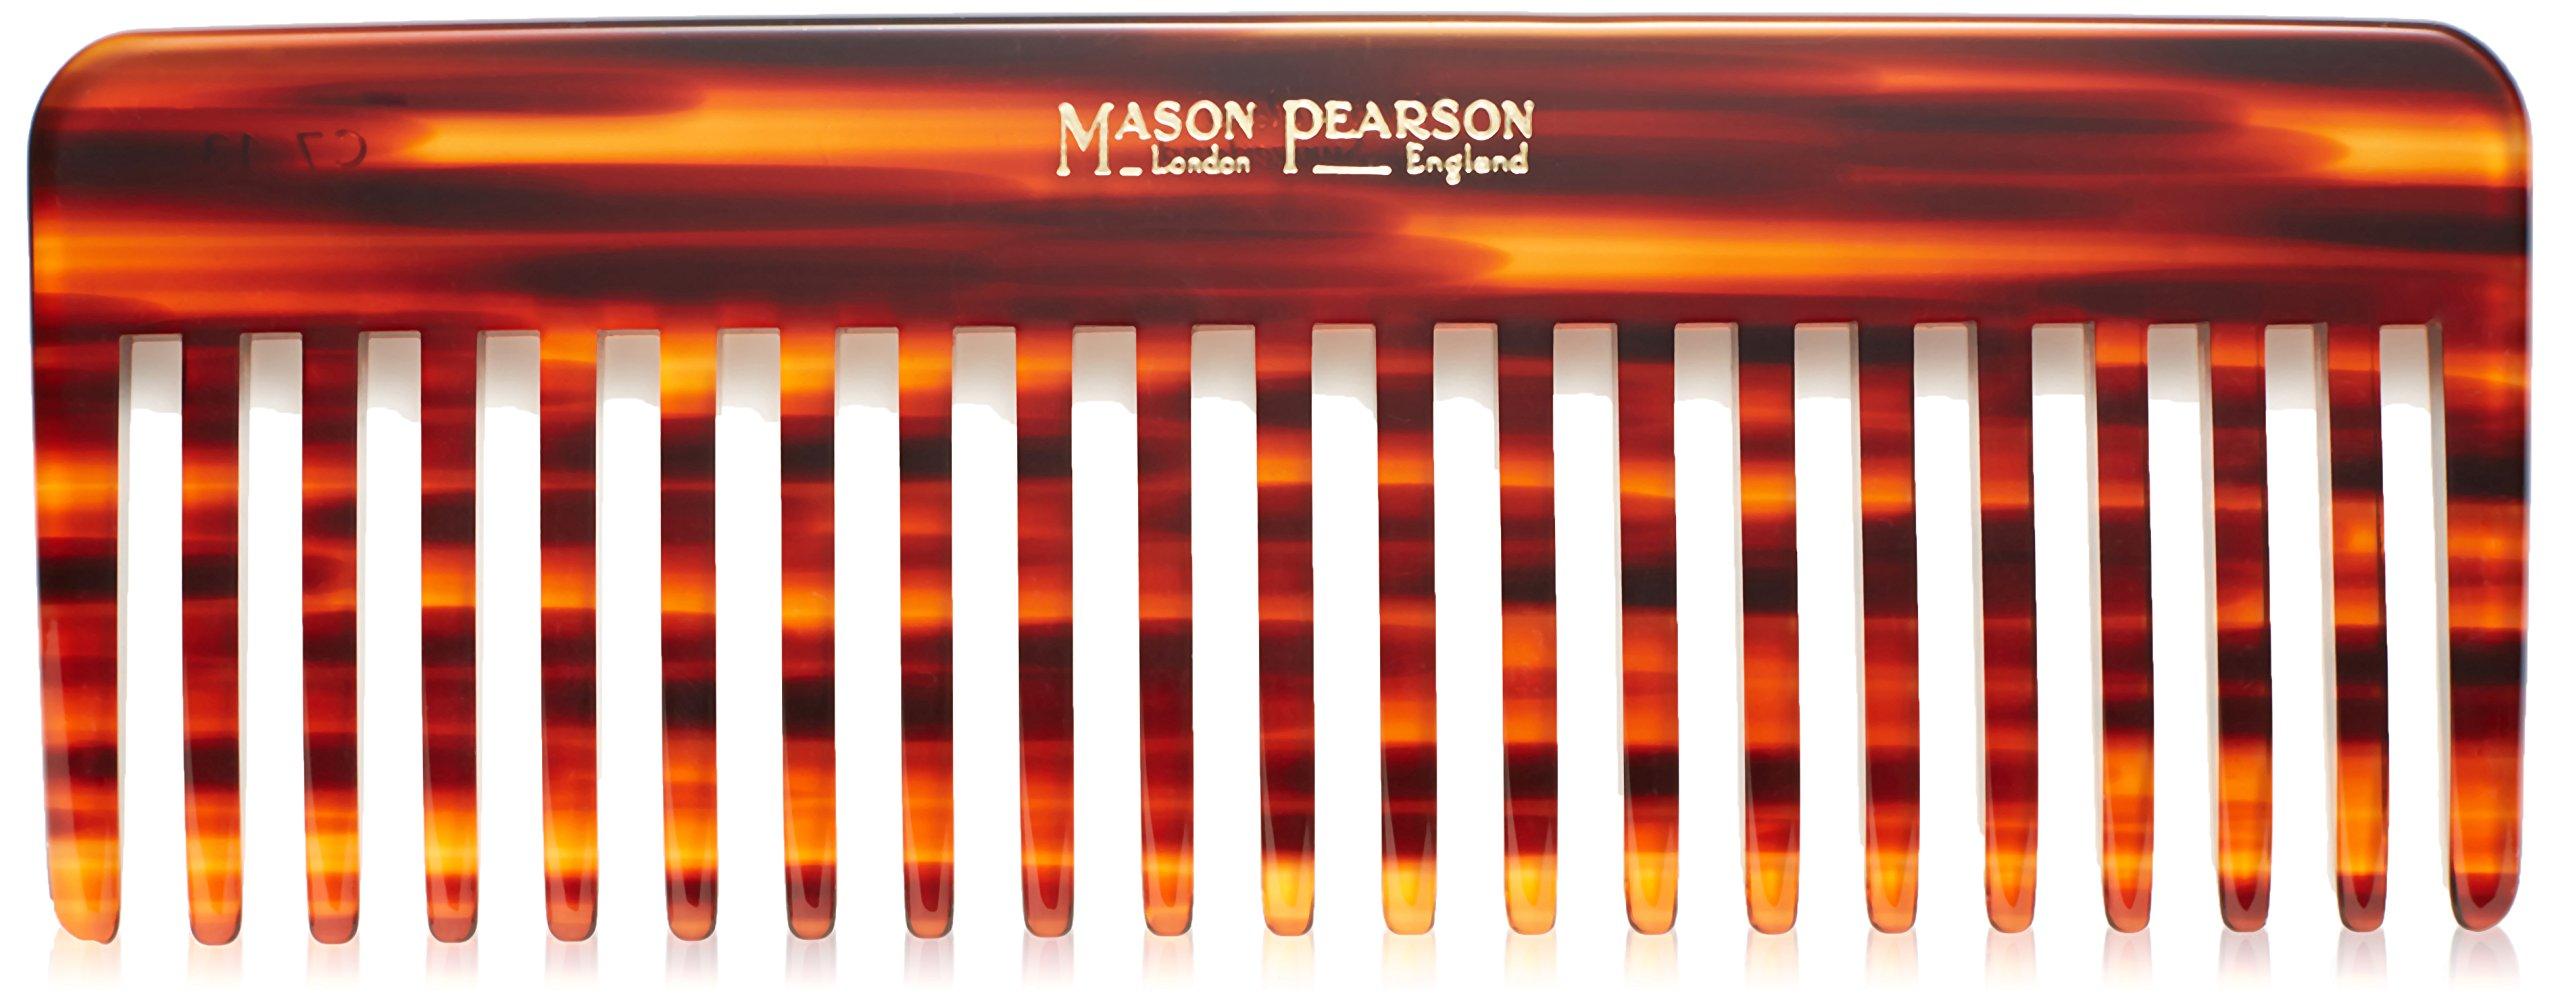 Mason Pearson Rake Comb by Mason Pearson